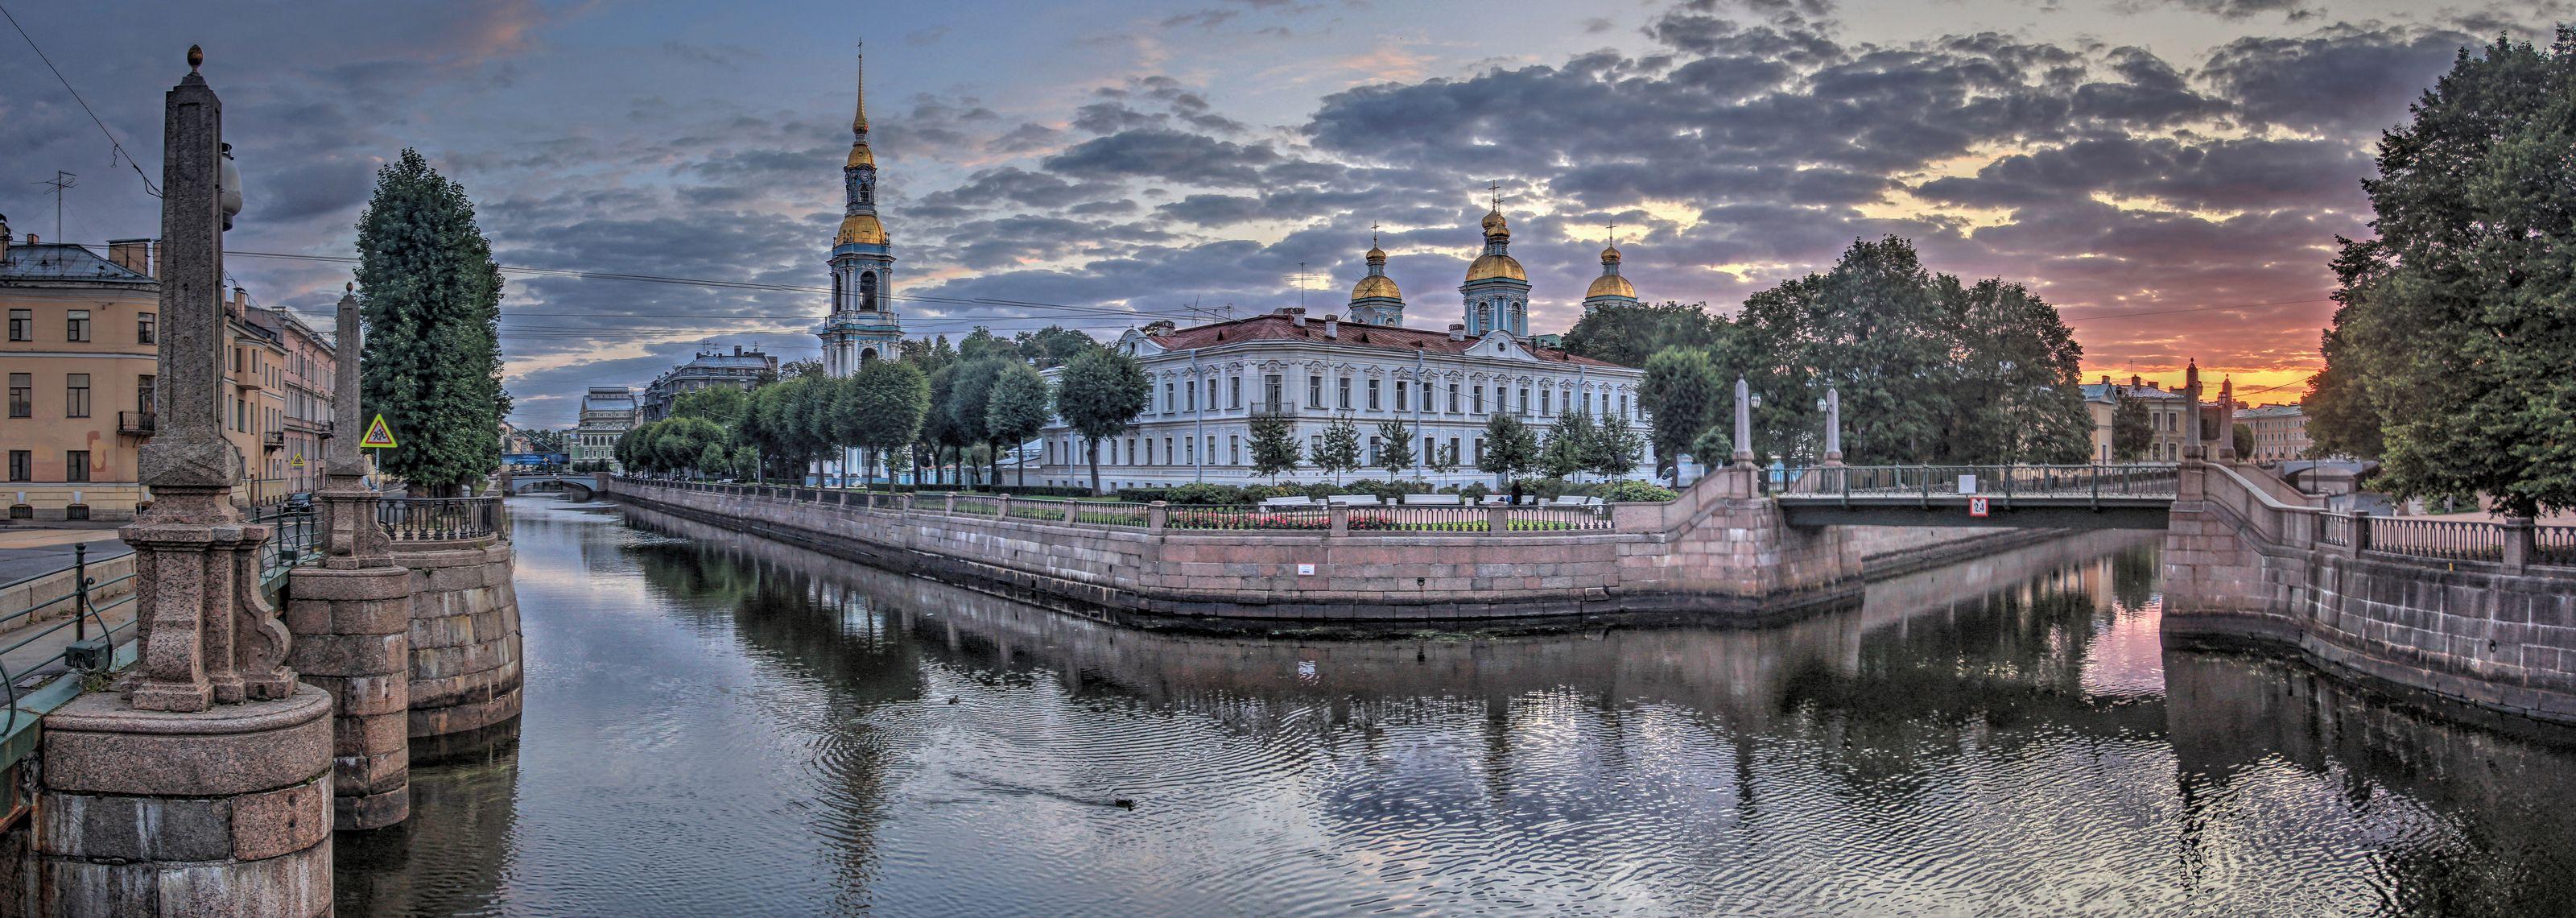 панорама, Сергей Григорьев